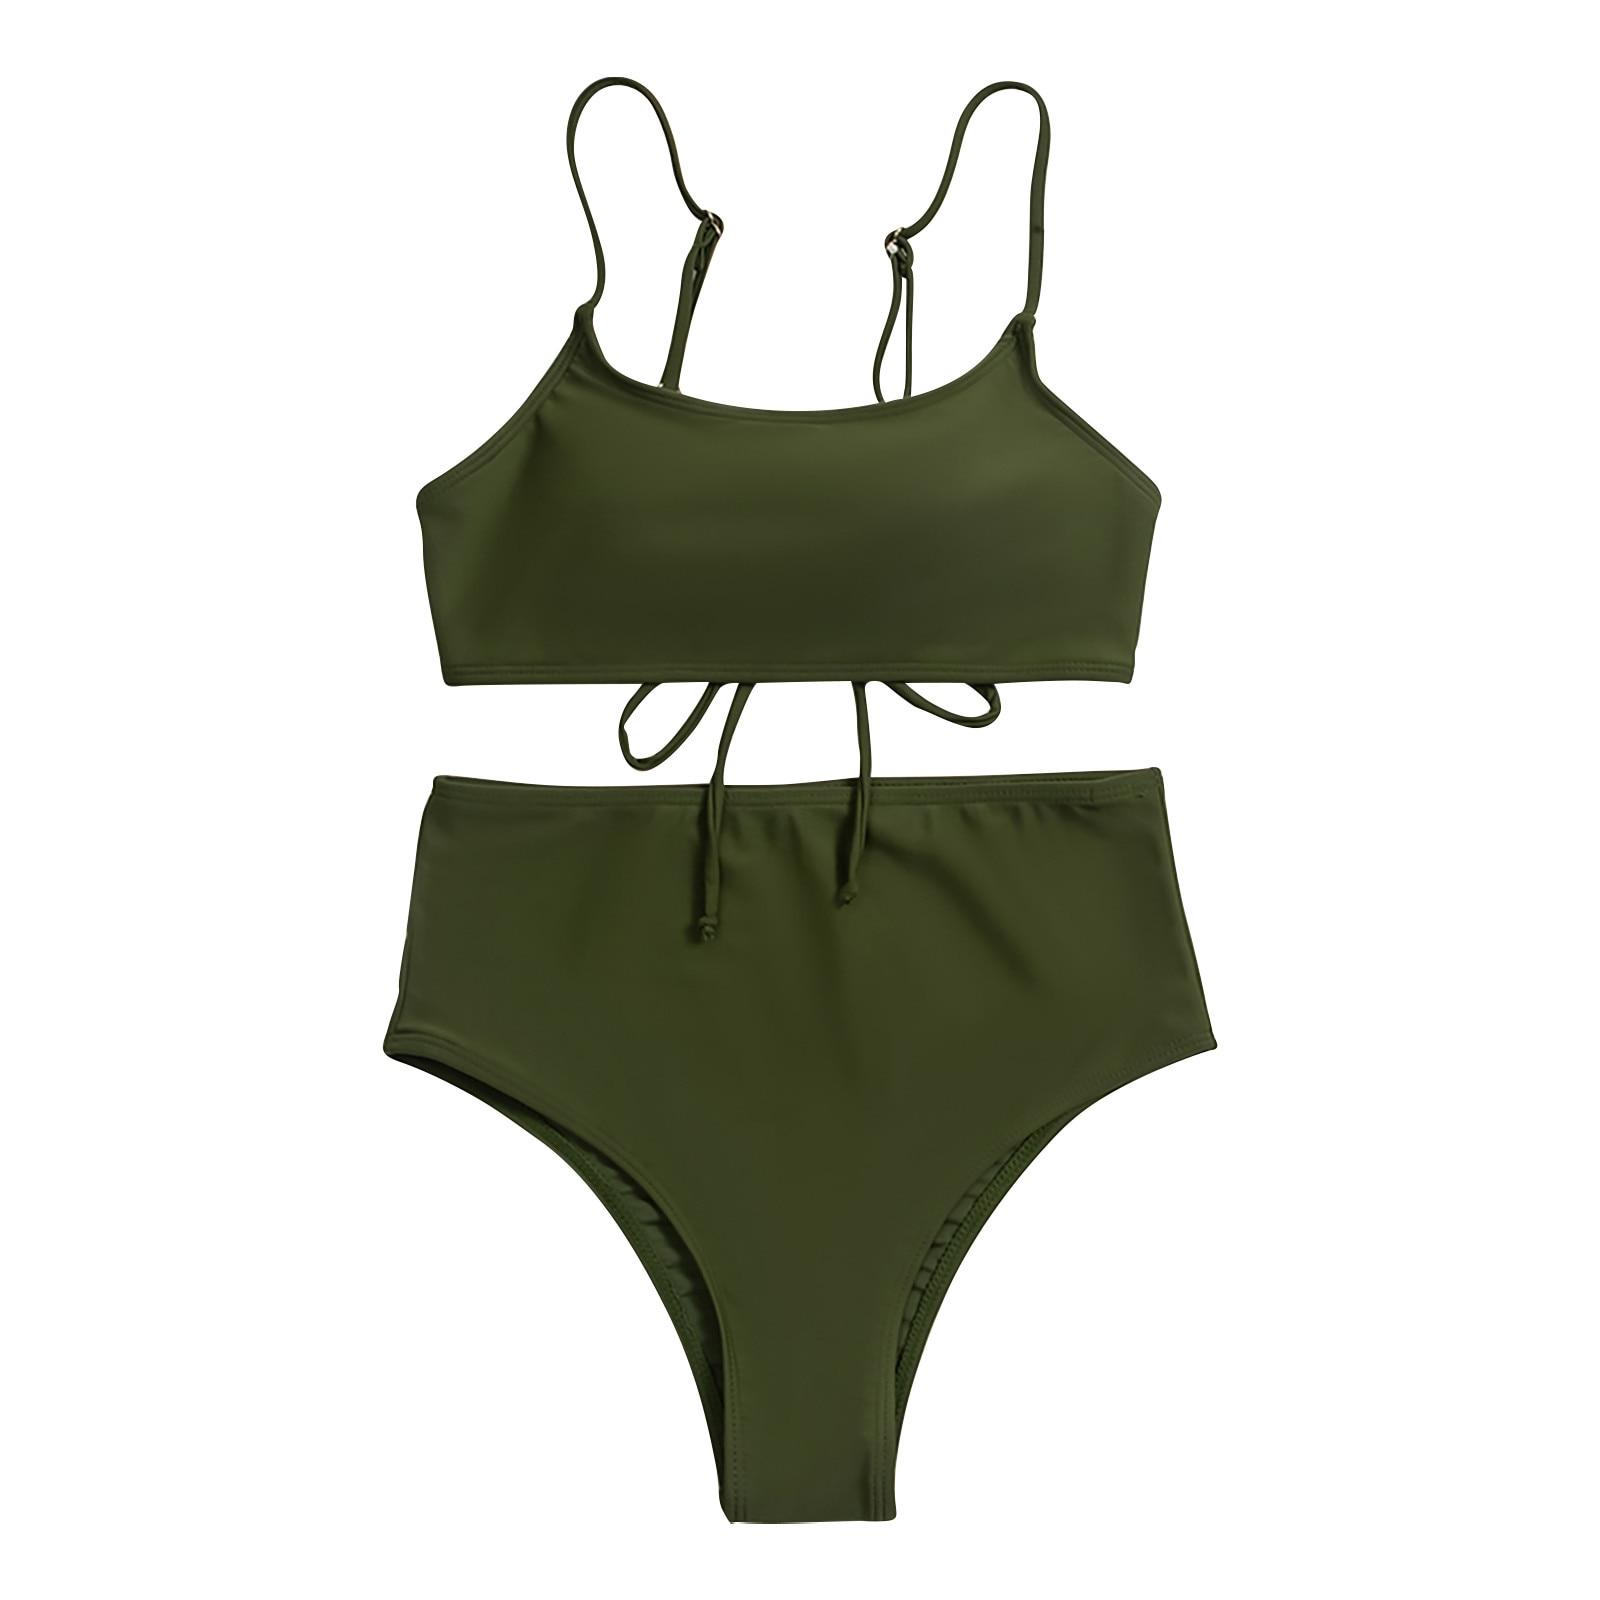 2021 bademode frauen Straping Feste Nähte Split Badeanzug Sexy Bademode Hohe Taille Push-Up Padded Badeanzug купальник